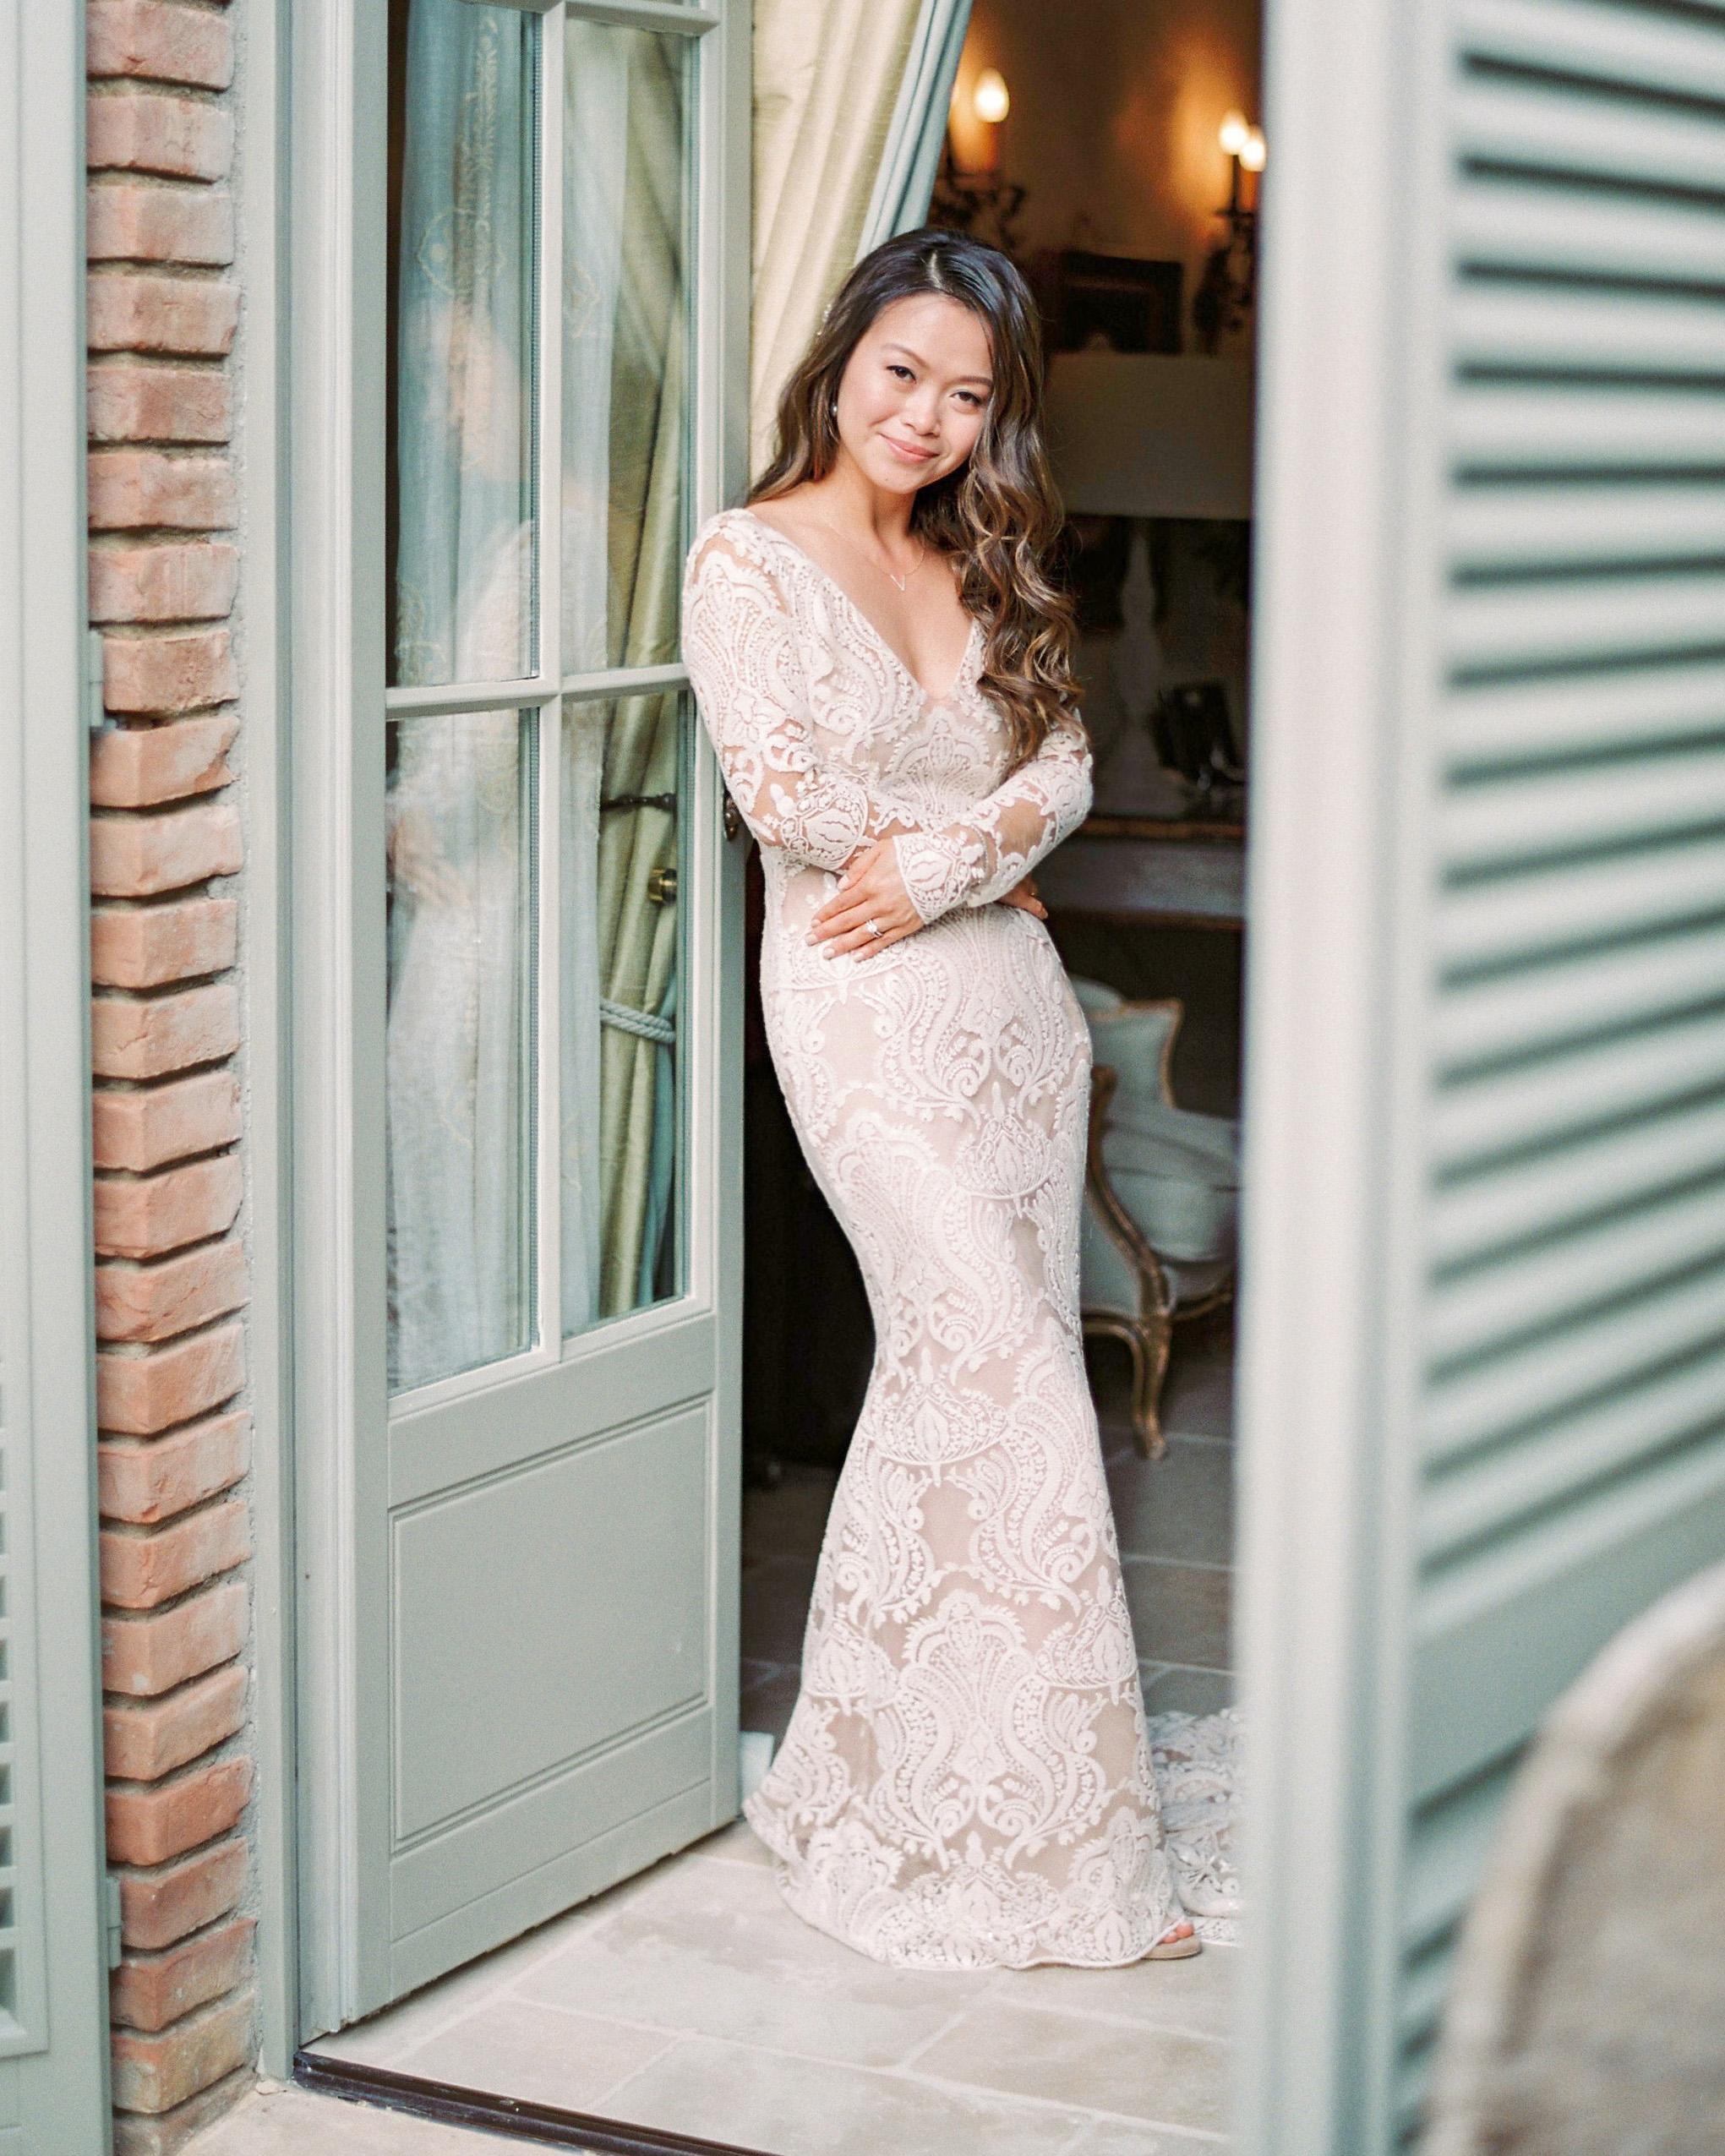 long sleeved wedding simple vneck dress